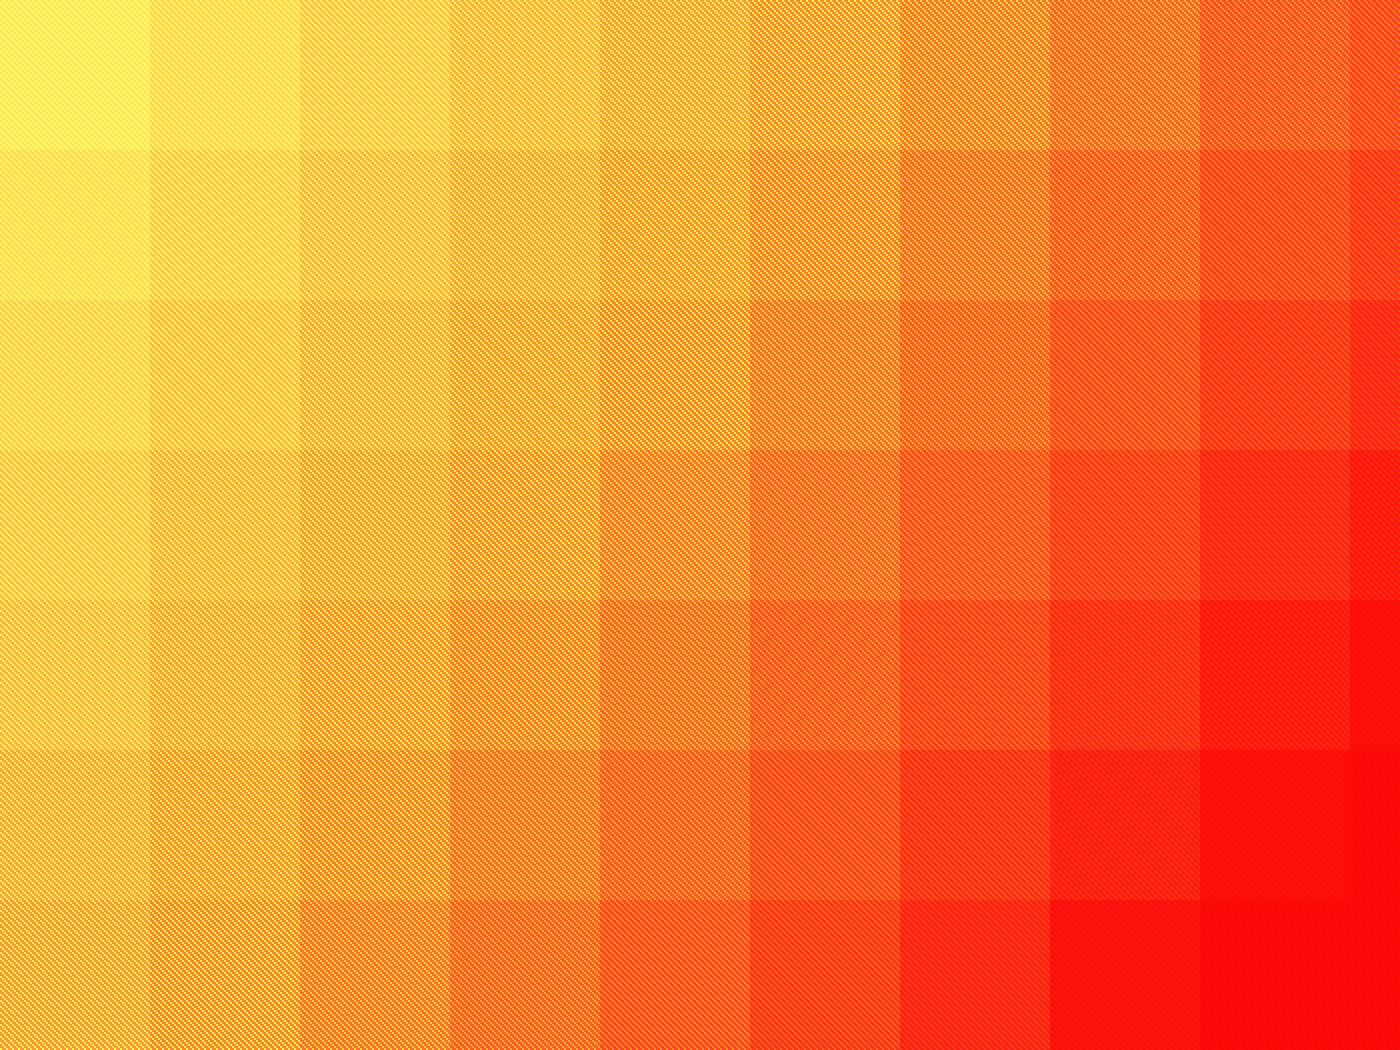 HD Orange Wallpaper Desktop Wallpapers   HD Wallpapers 1400x1050